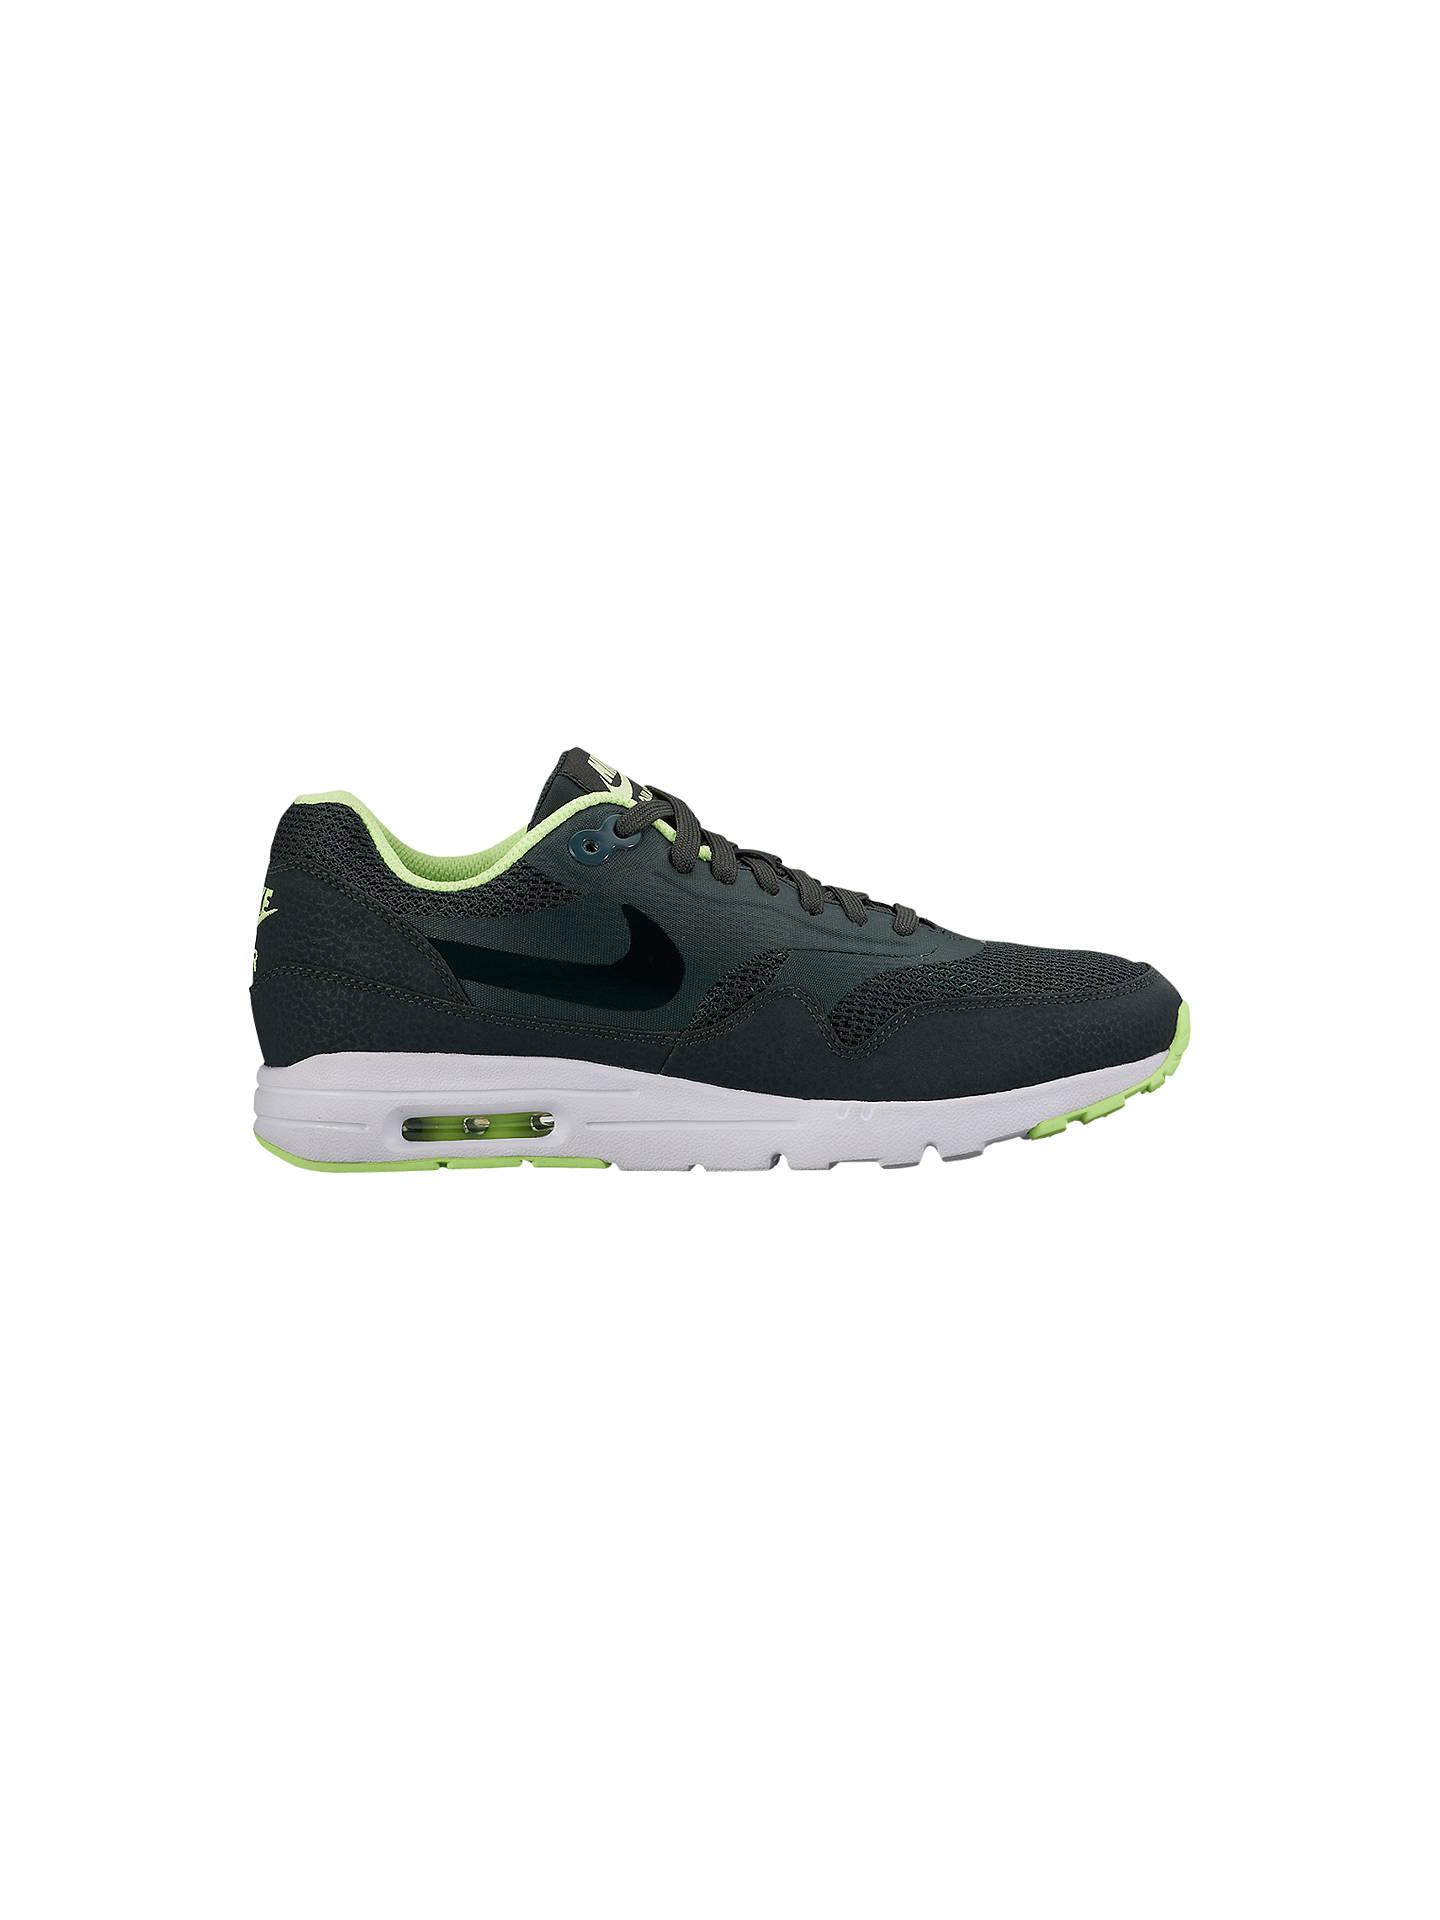 Nike Air Max 1 · Womens Shoes Online